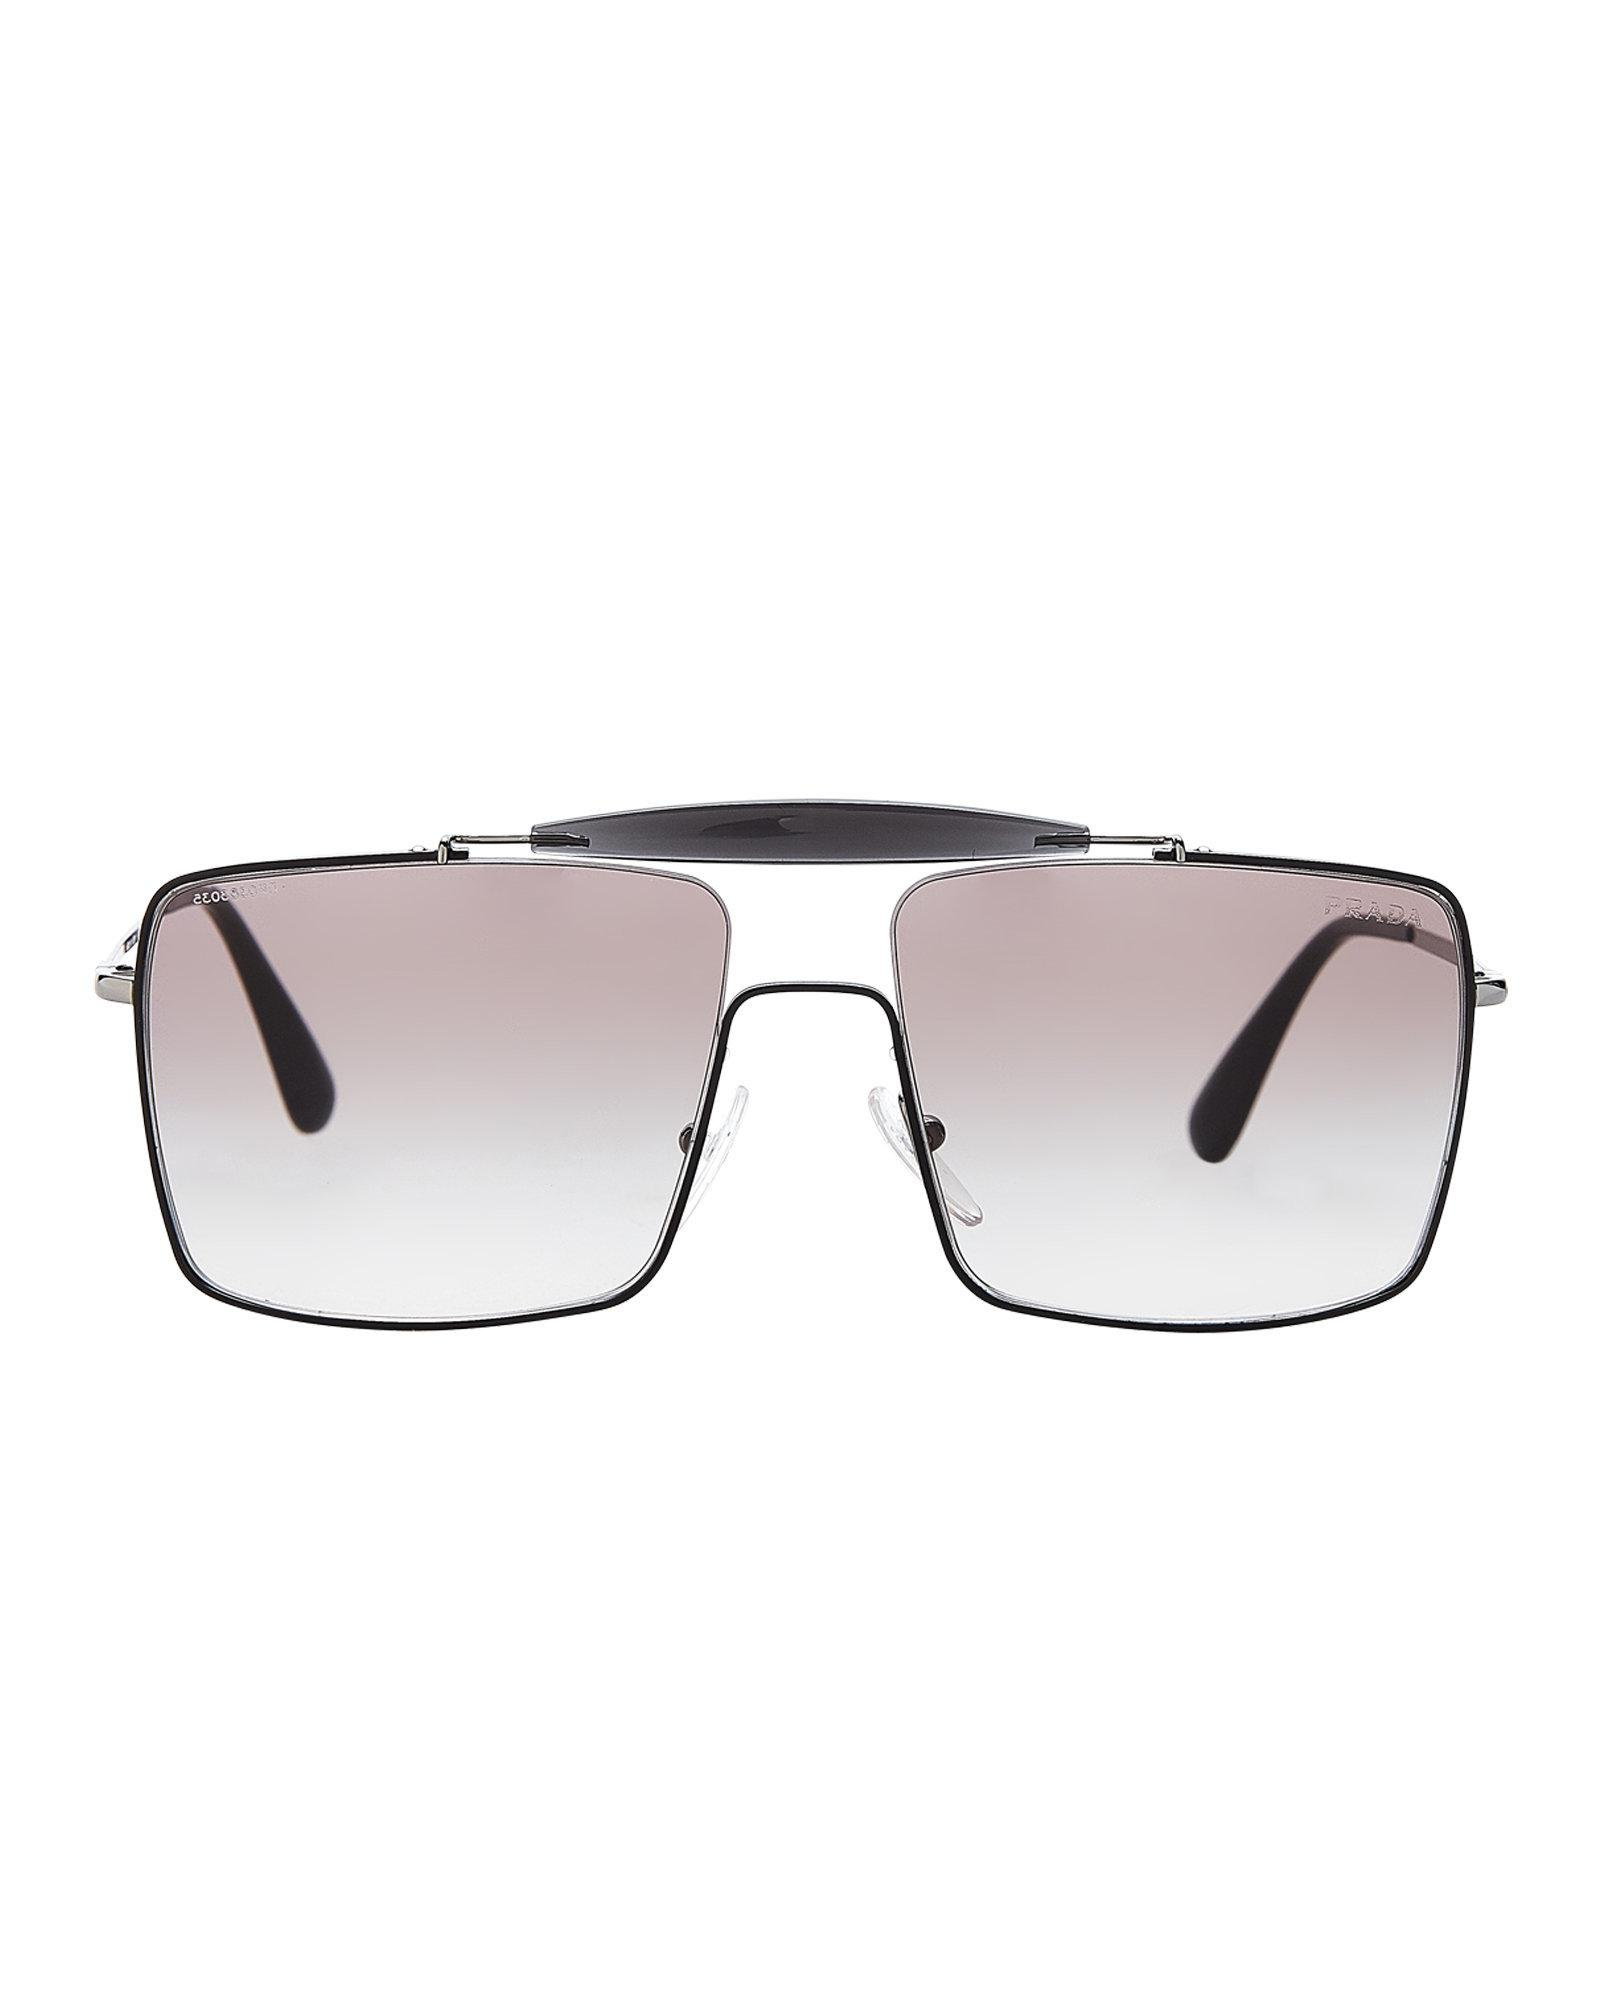 b0dd7ae1eb80 ... get prada spr 57s black navigator sunglasses for men lyst. view  fullscreen bece0 56185